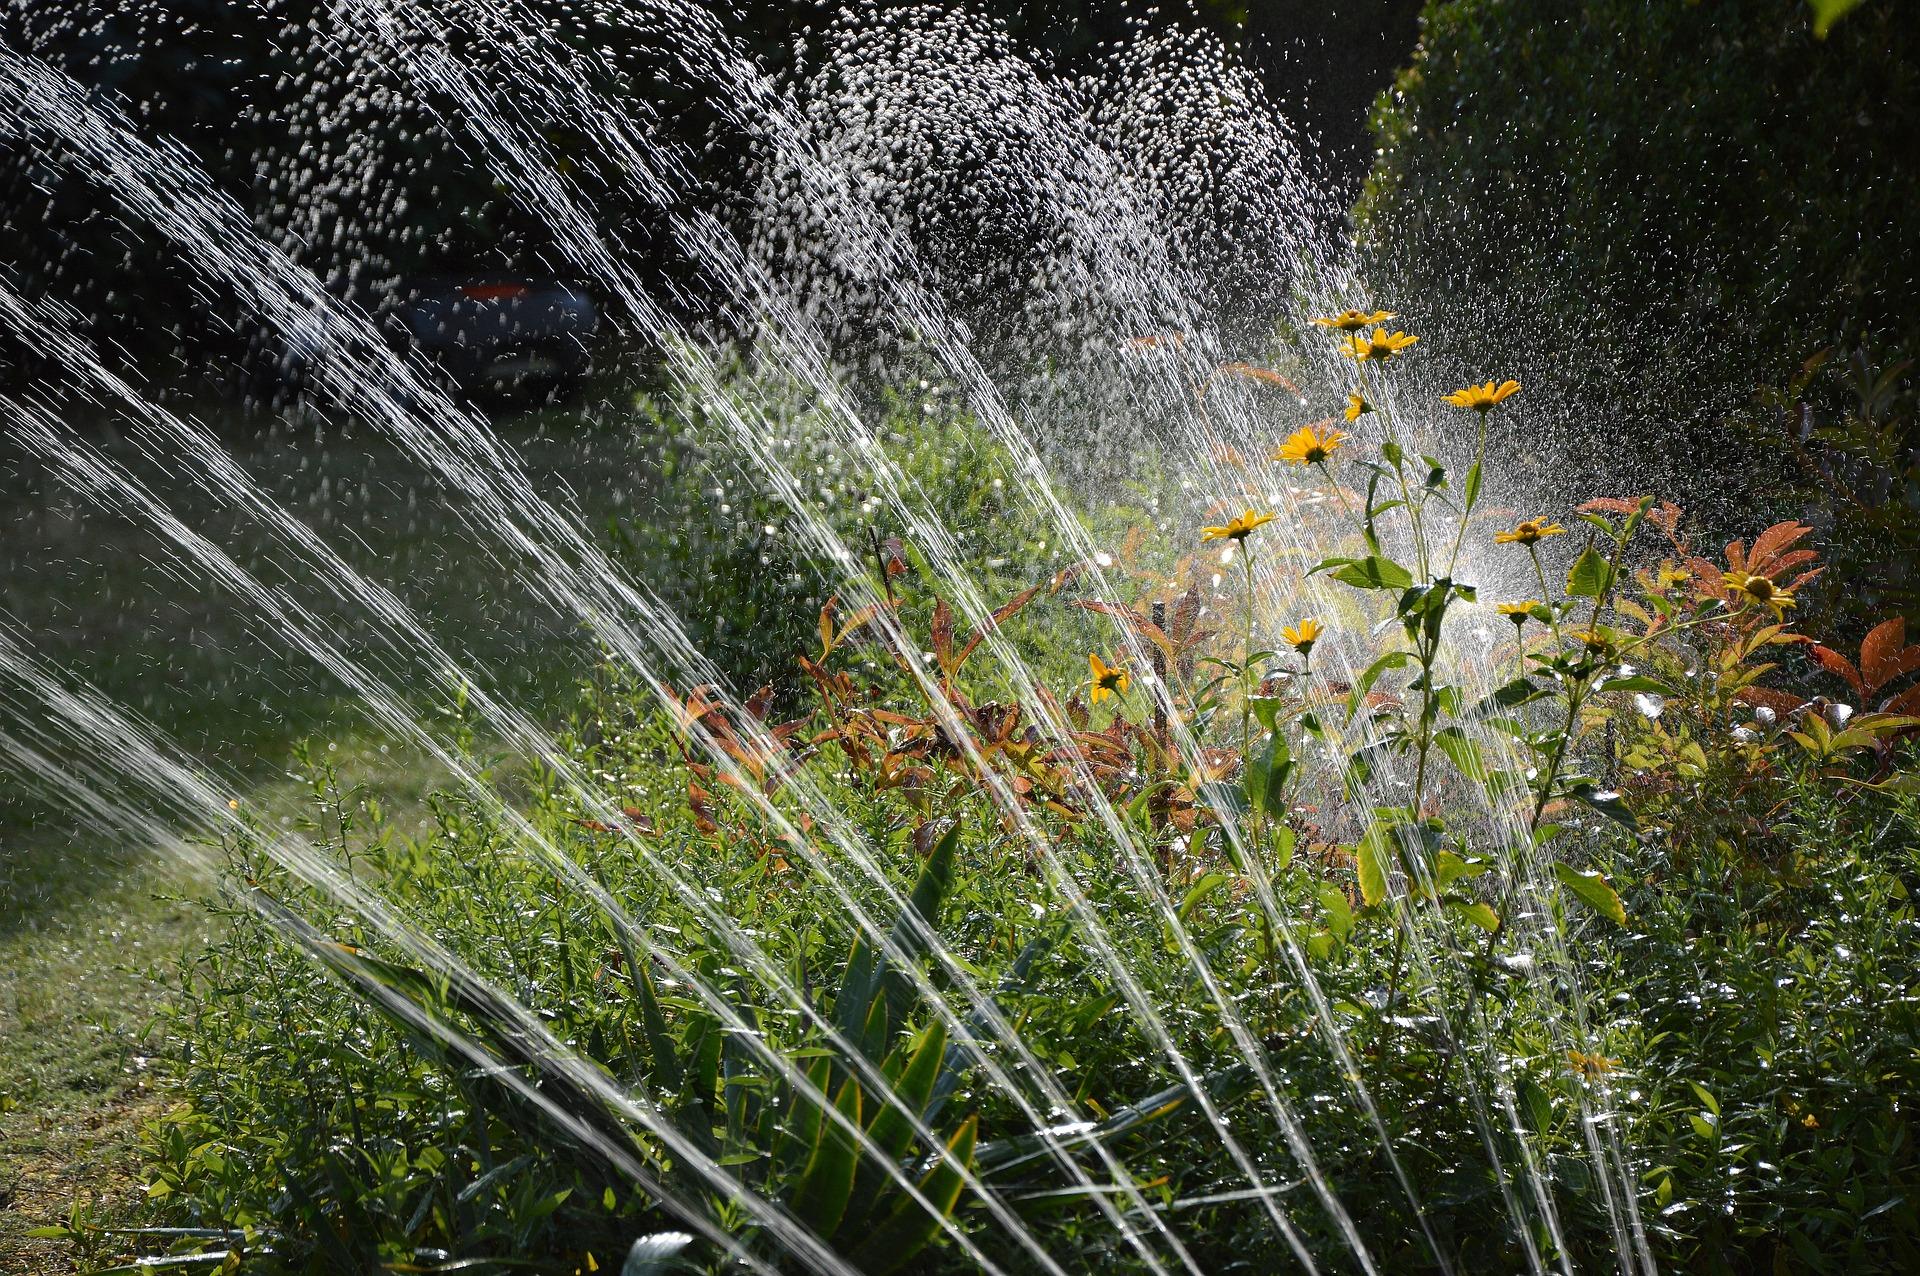 gartensprinkler-Garten-Blumen